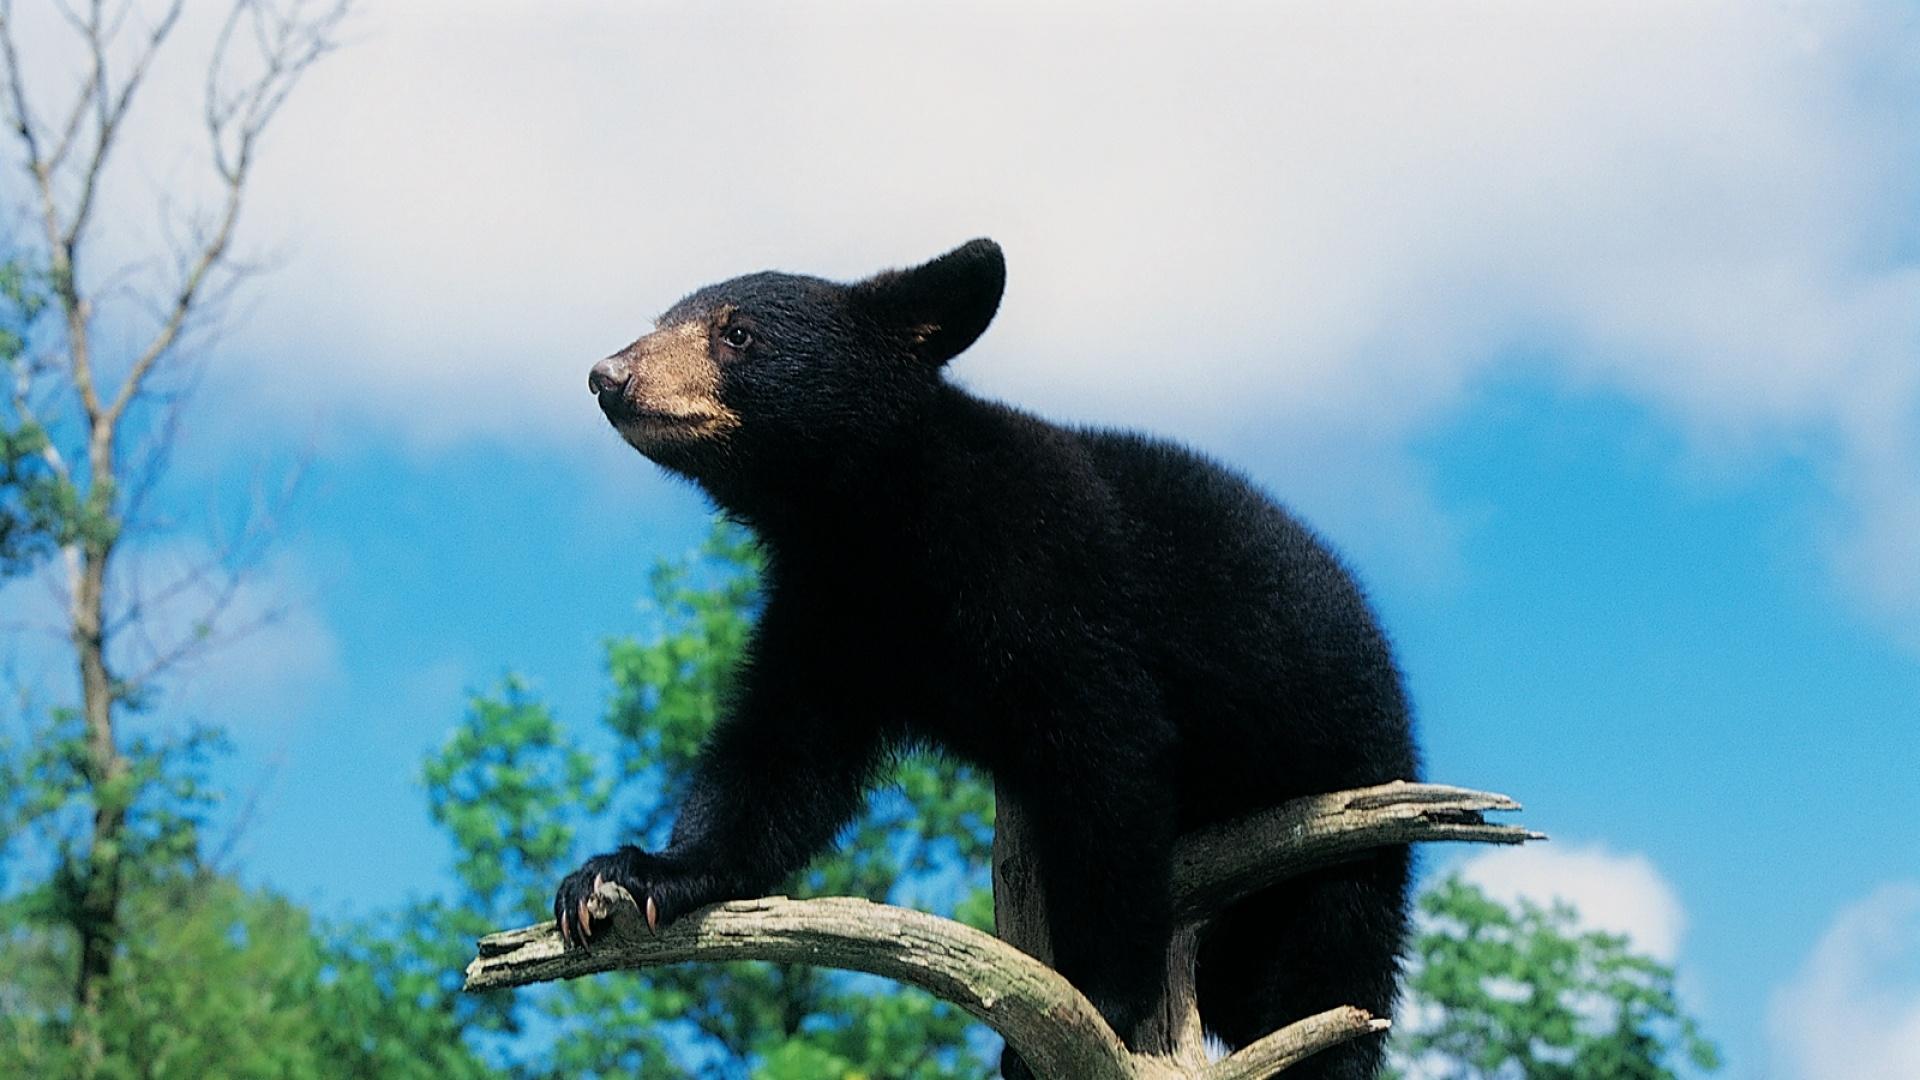 Black Bear hd desktop wallpaper